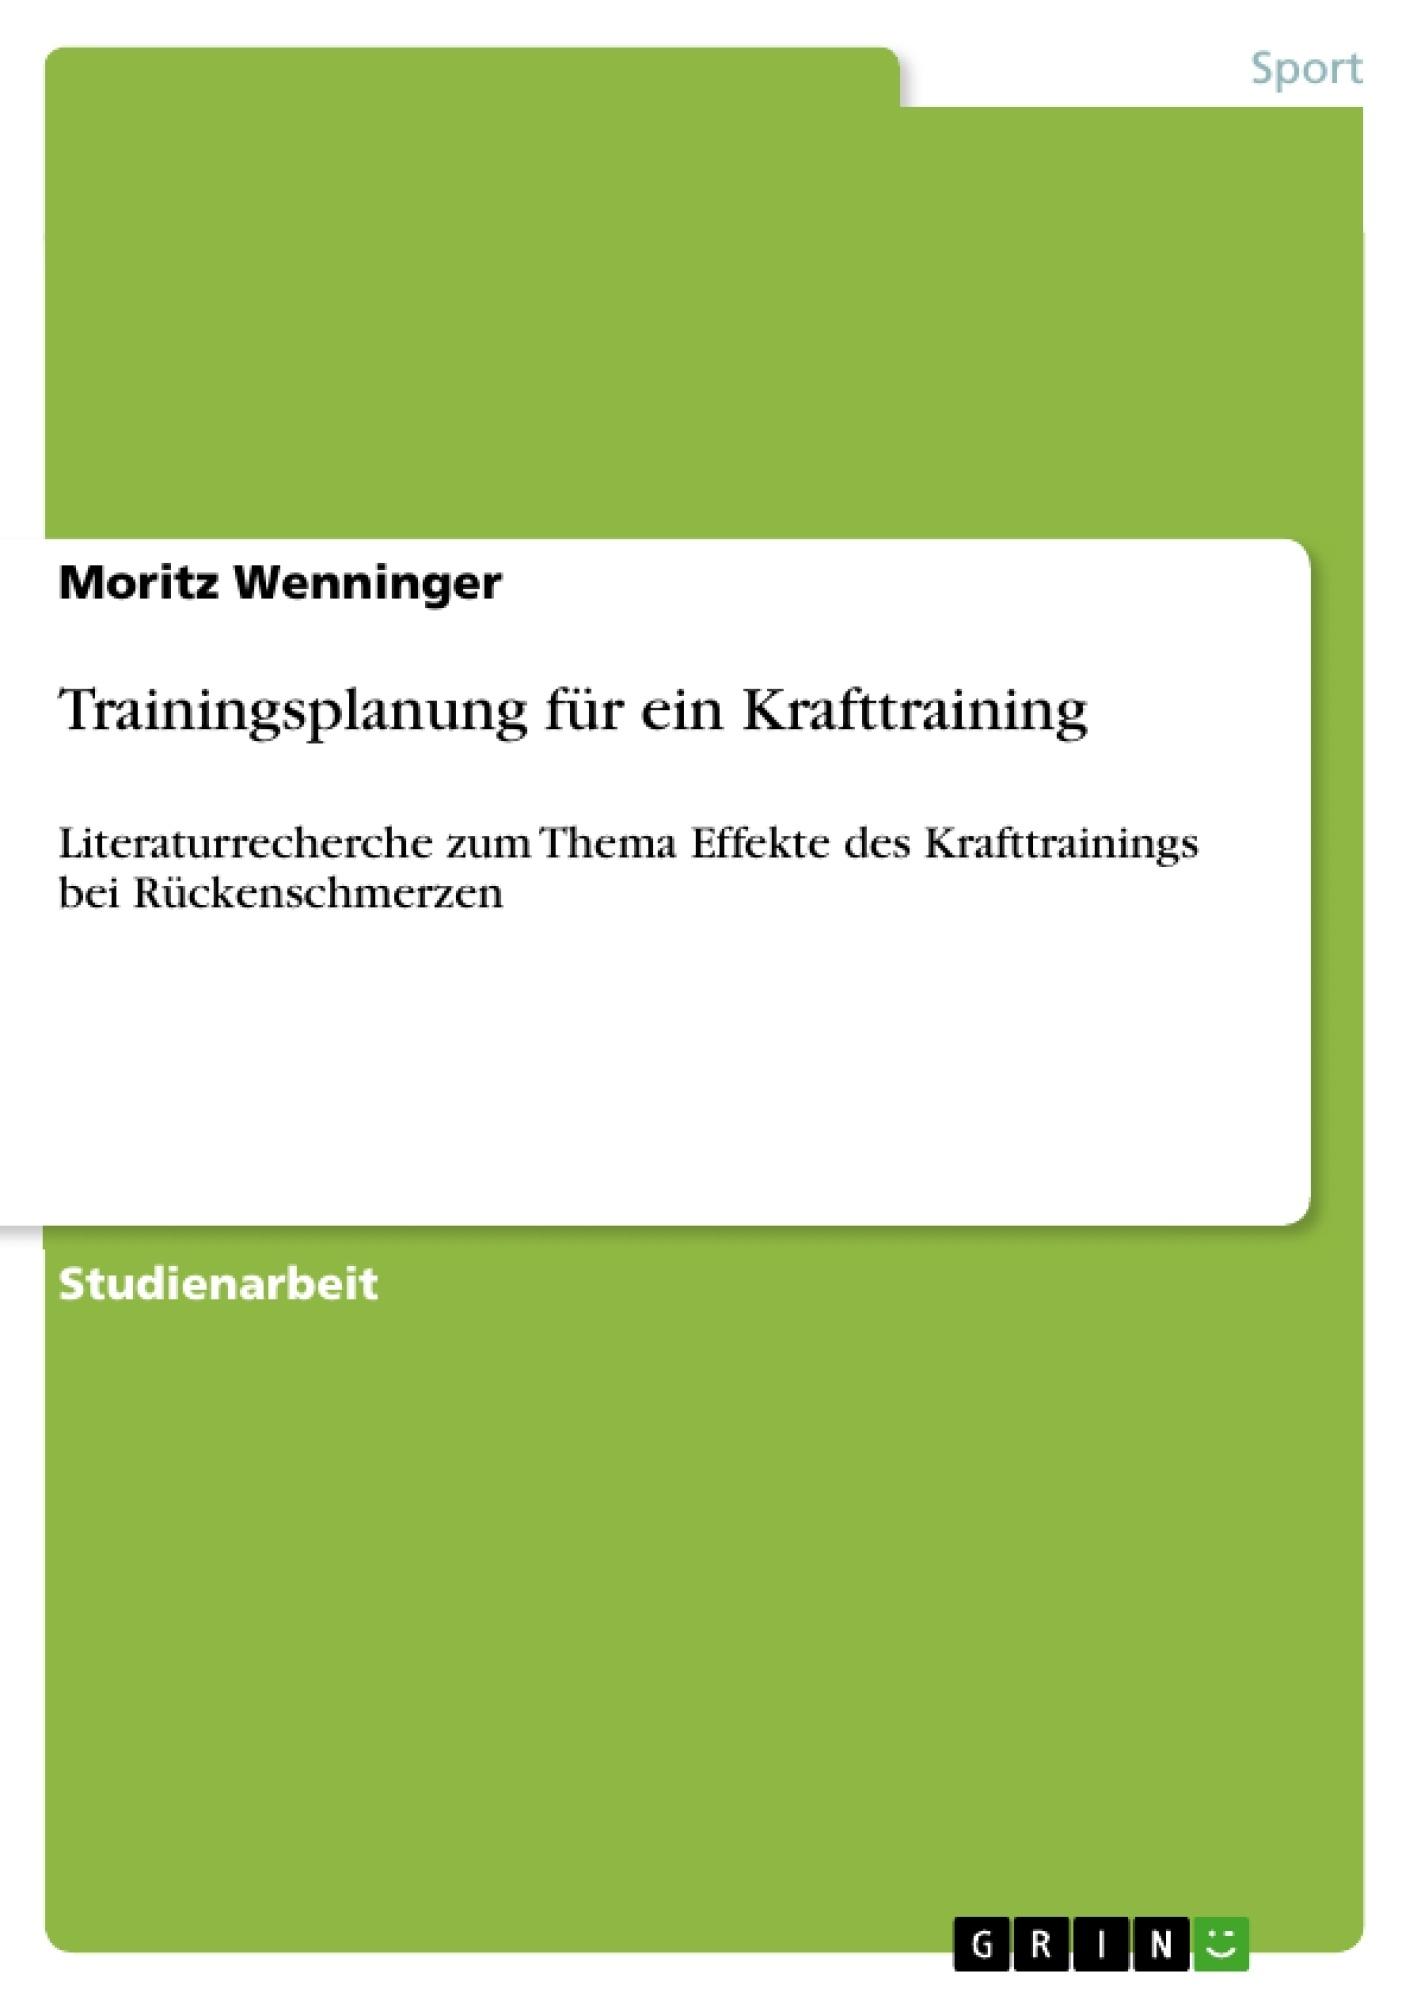 Titel: Trainingsplanung für ein Krafttraining